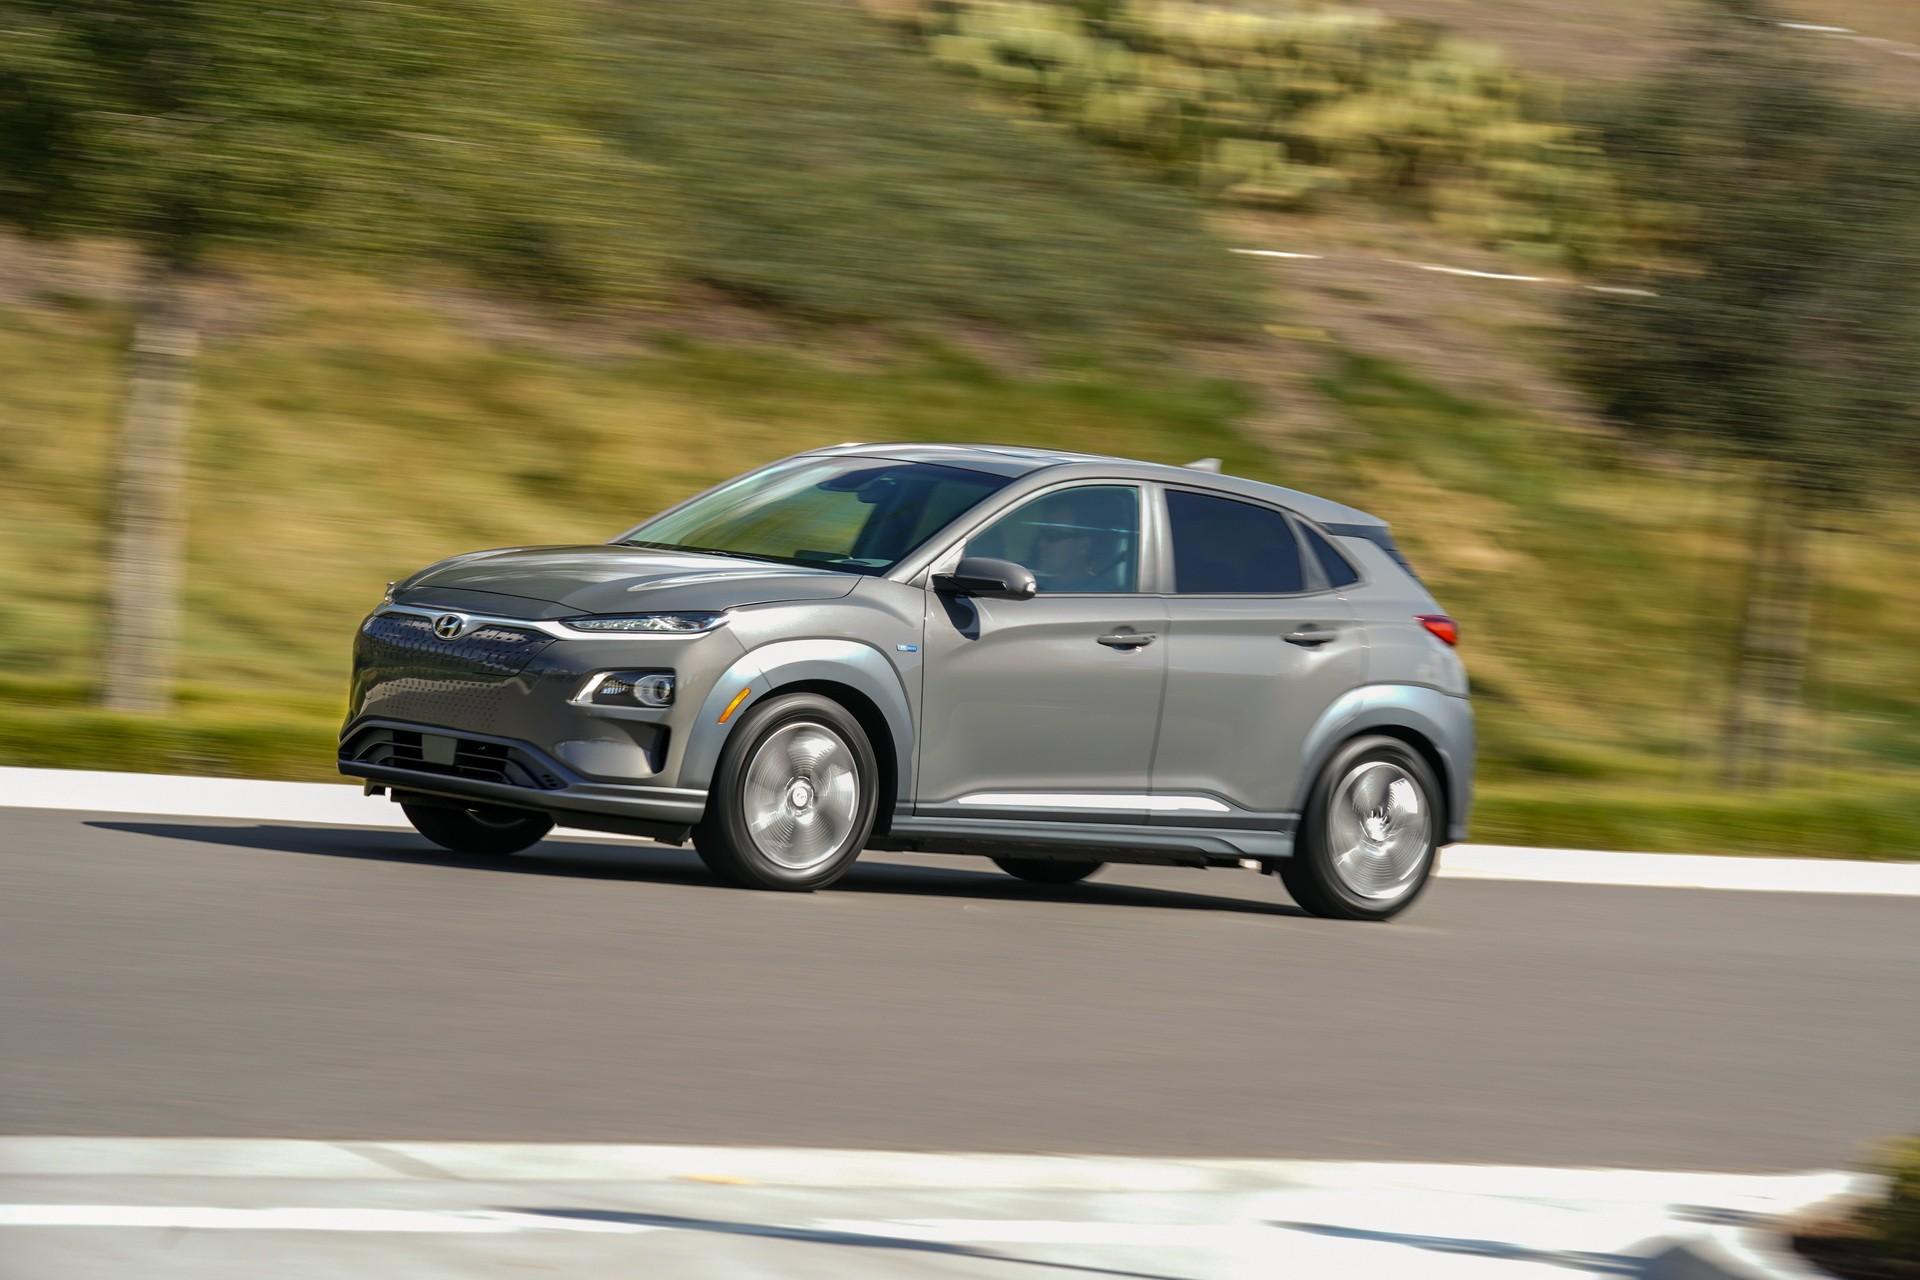 2019 Hyundai Kona Electric Gets EPA-rated 258 Miles Of ...